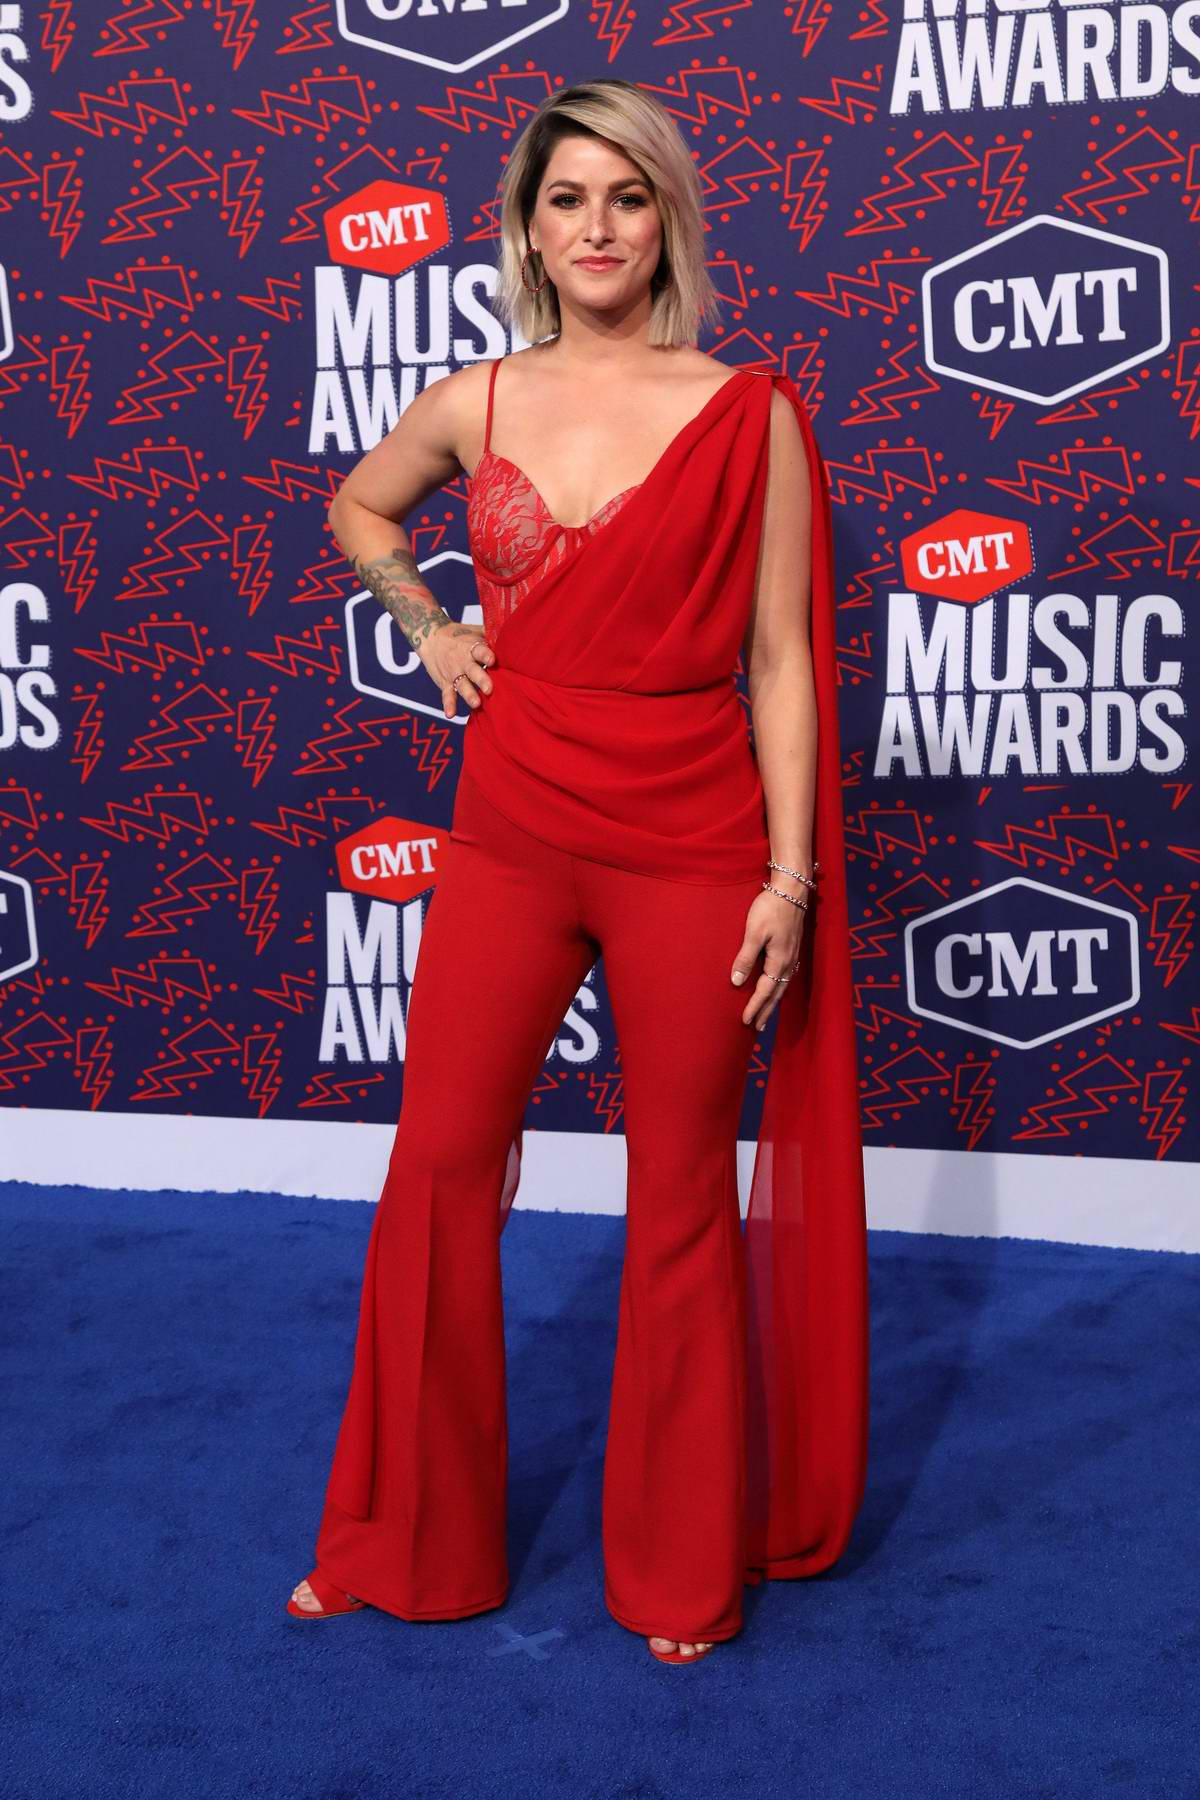 Cassadee Pope attends the 2019 CMT Music Awards at Bridgestone Arena in Nashville, TN